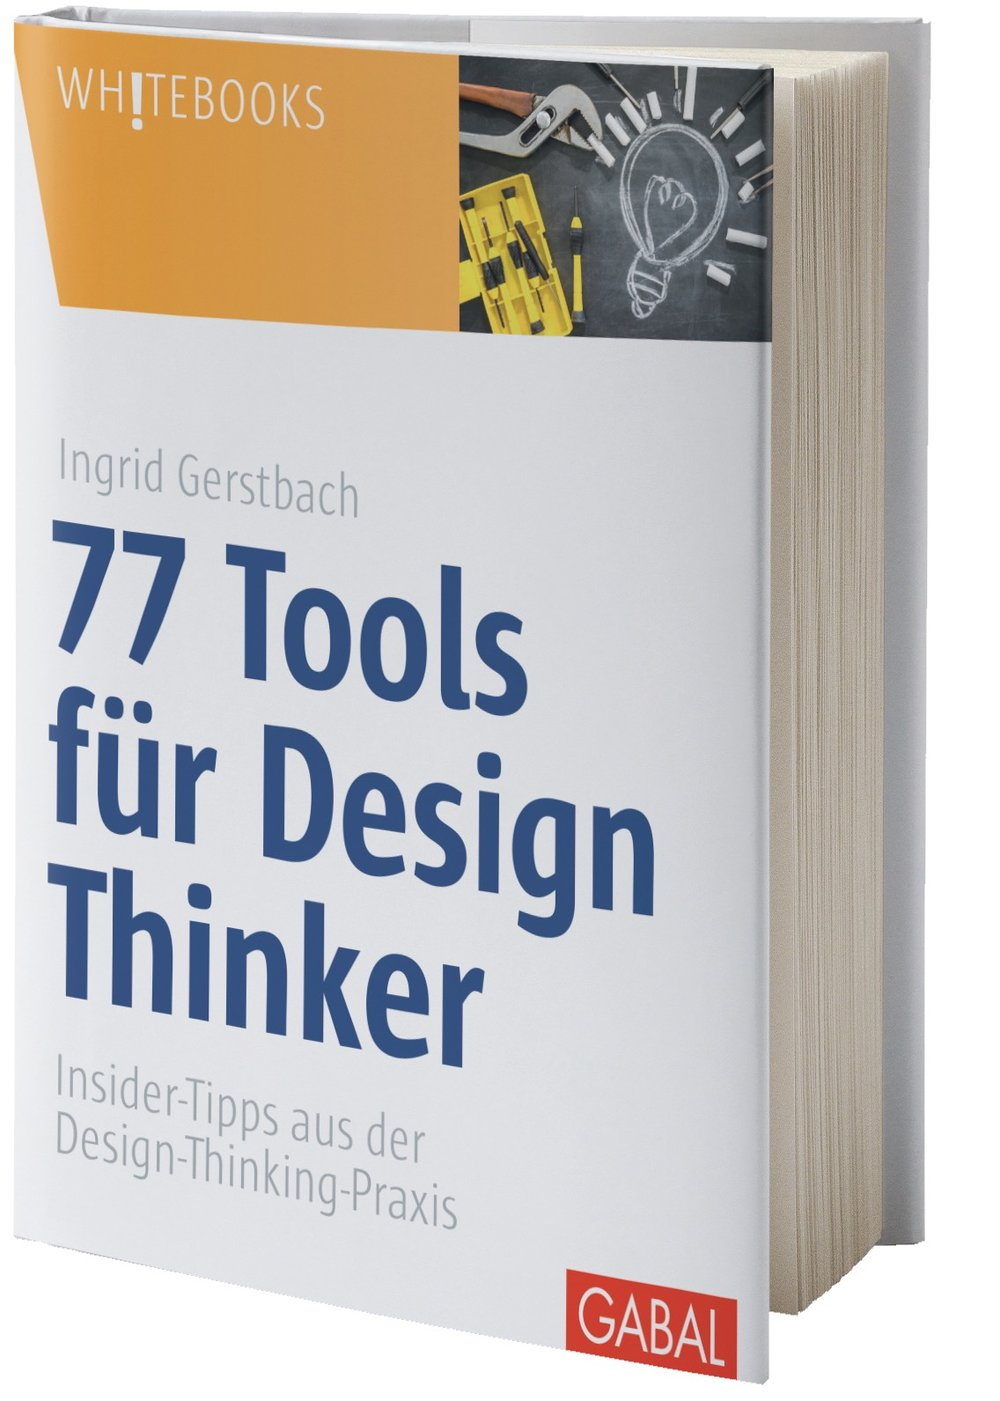 ingrid-gerstbach-buch-77-tools-fuer-design-thinker.jpg